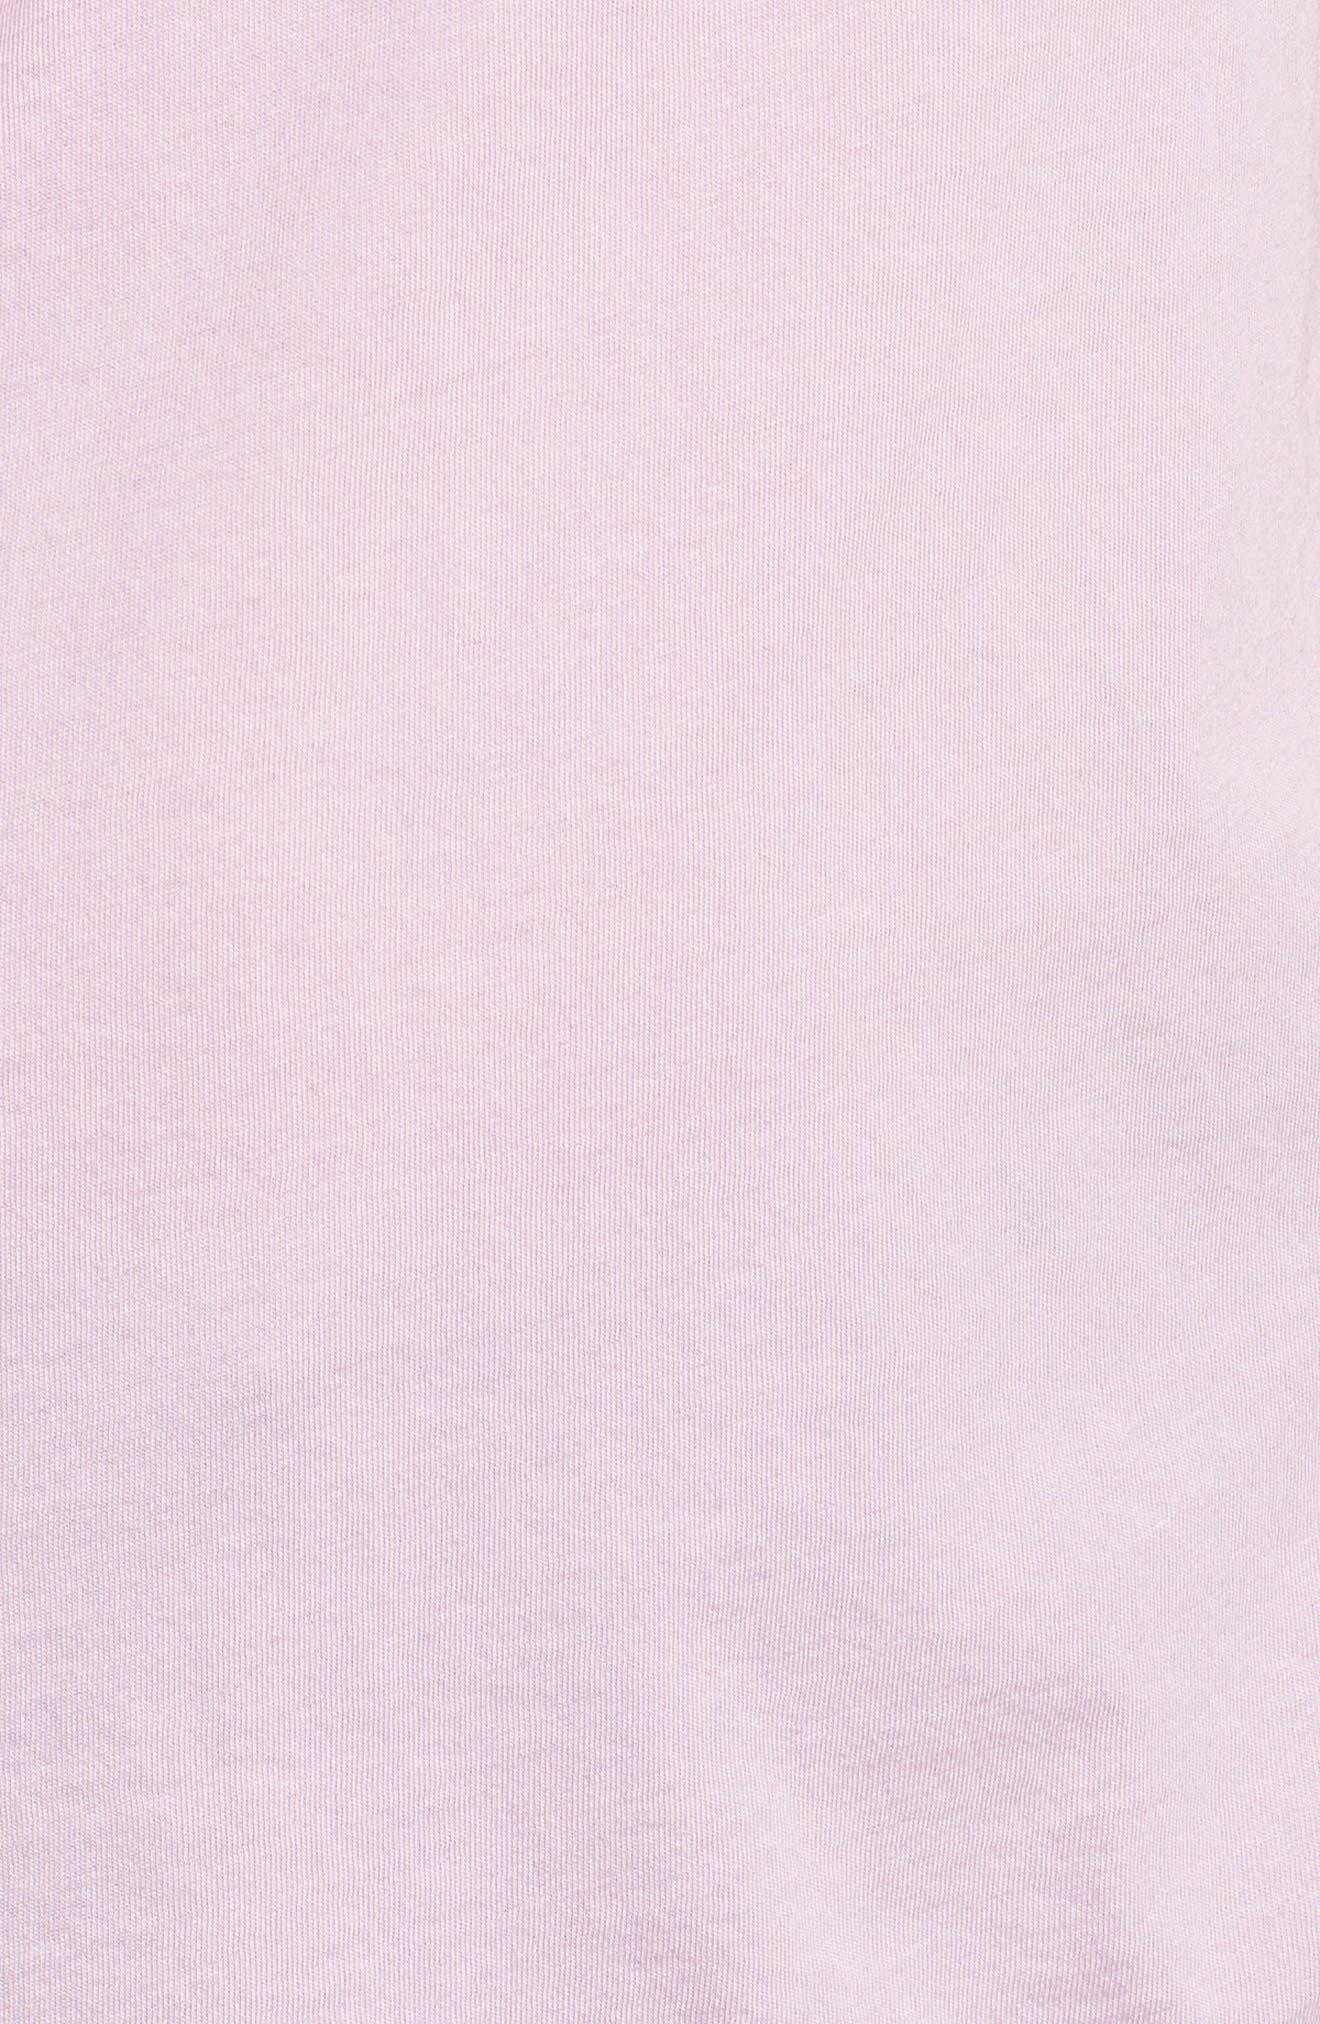 Henson Tee,                             Alternate thumbnail 175, color,